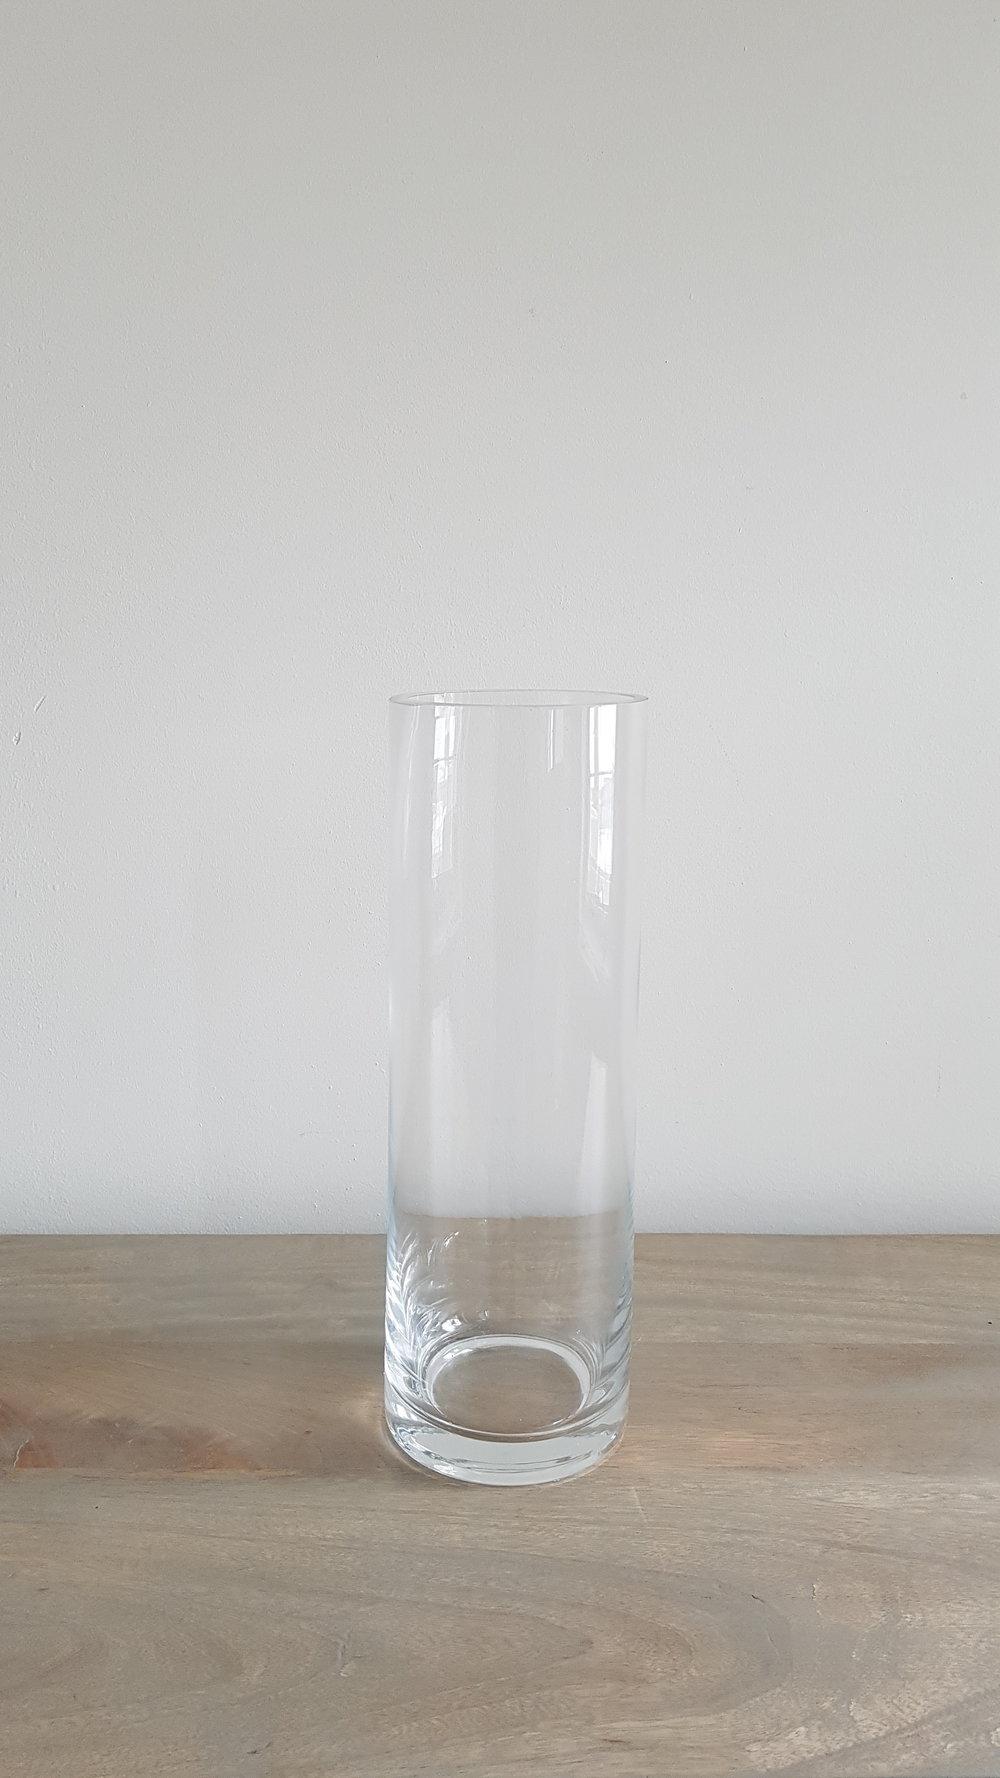 "12"" Glass Cylinder Vase - $2 each   Qty: 50"